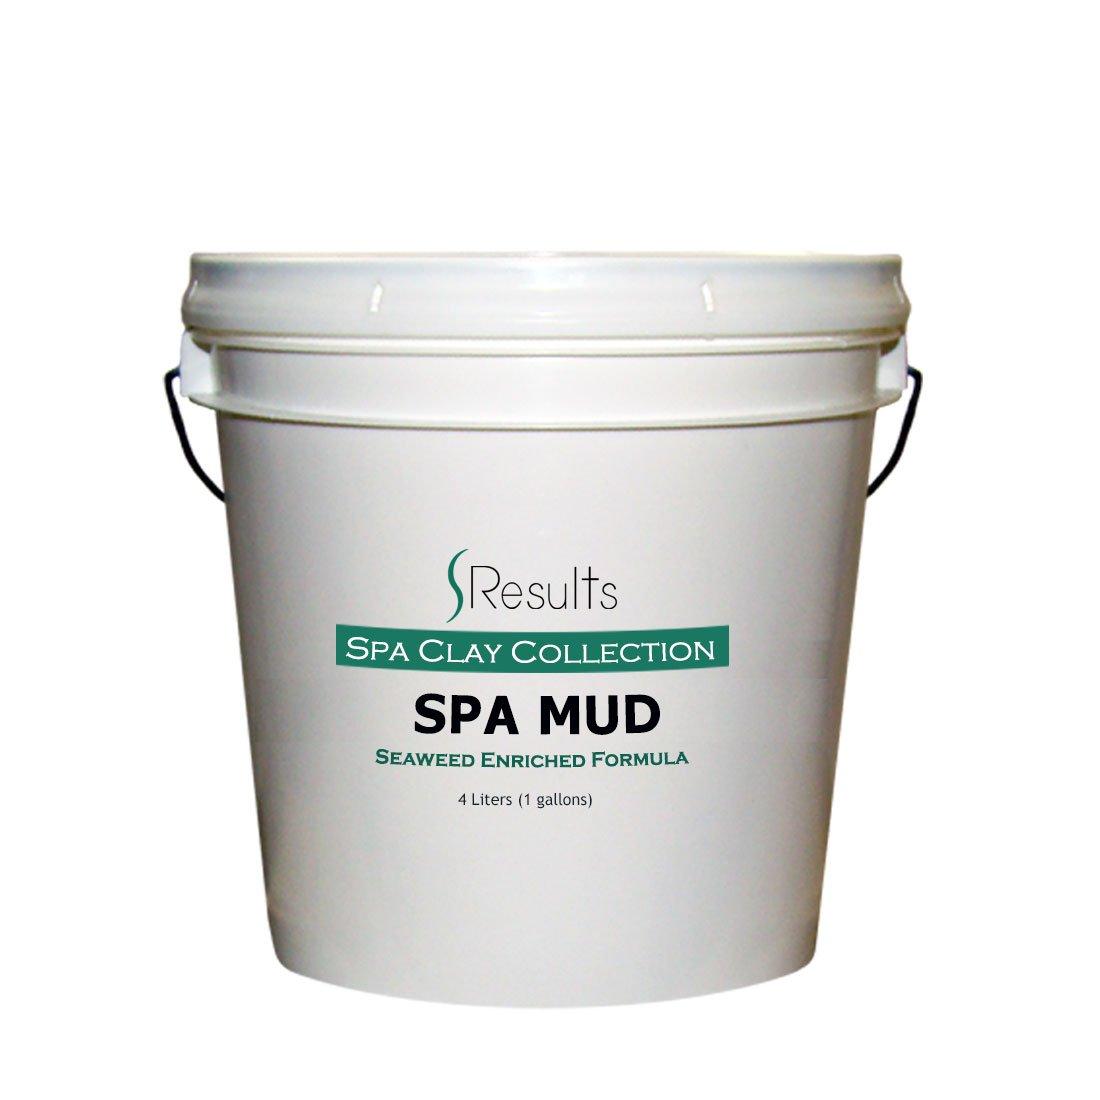 Spa Mud (Seaweed) Body Wrap Detox & Anti-cellulite Slimming Formula - 1 gallon (4 liter)